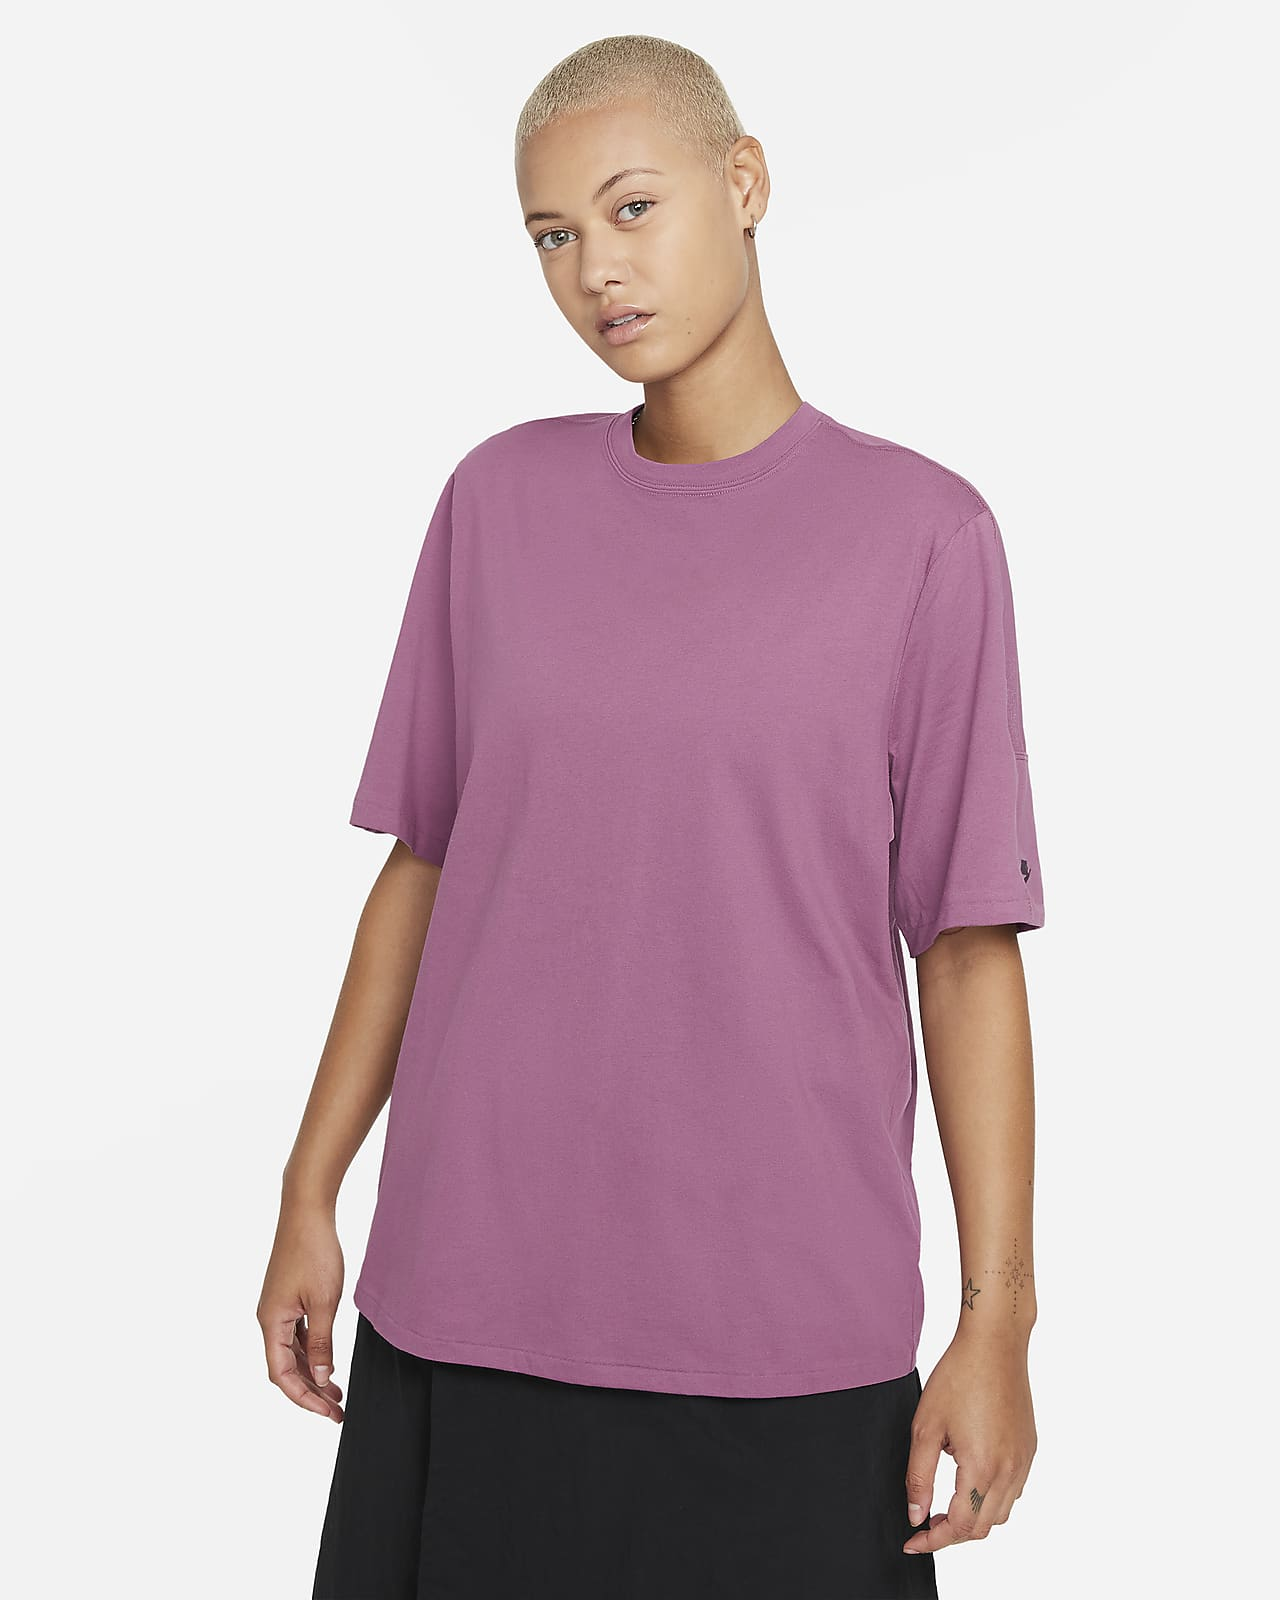 Женская футболка с коротким рукавом Nike Sportswear Dri-FIT ADV Tech Pack